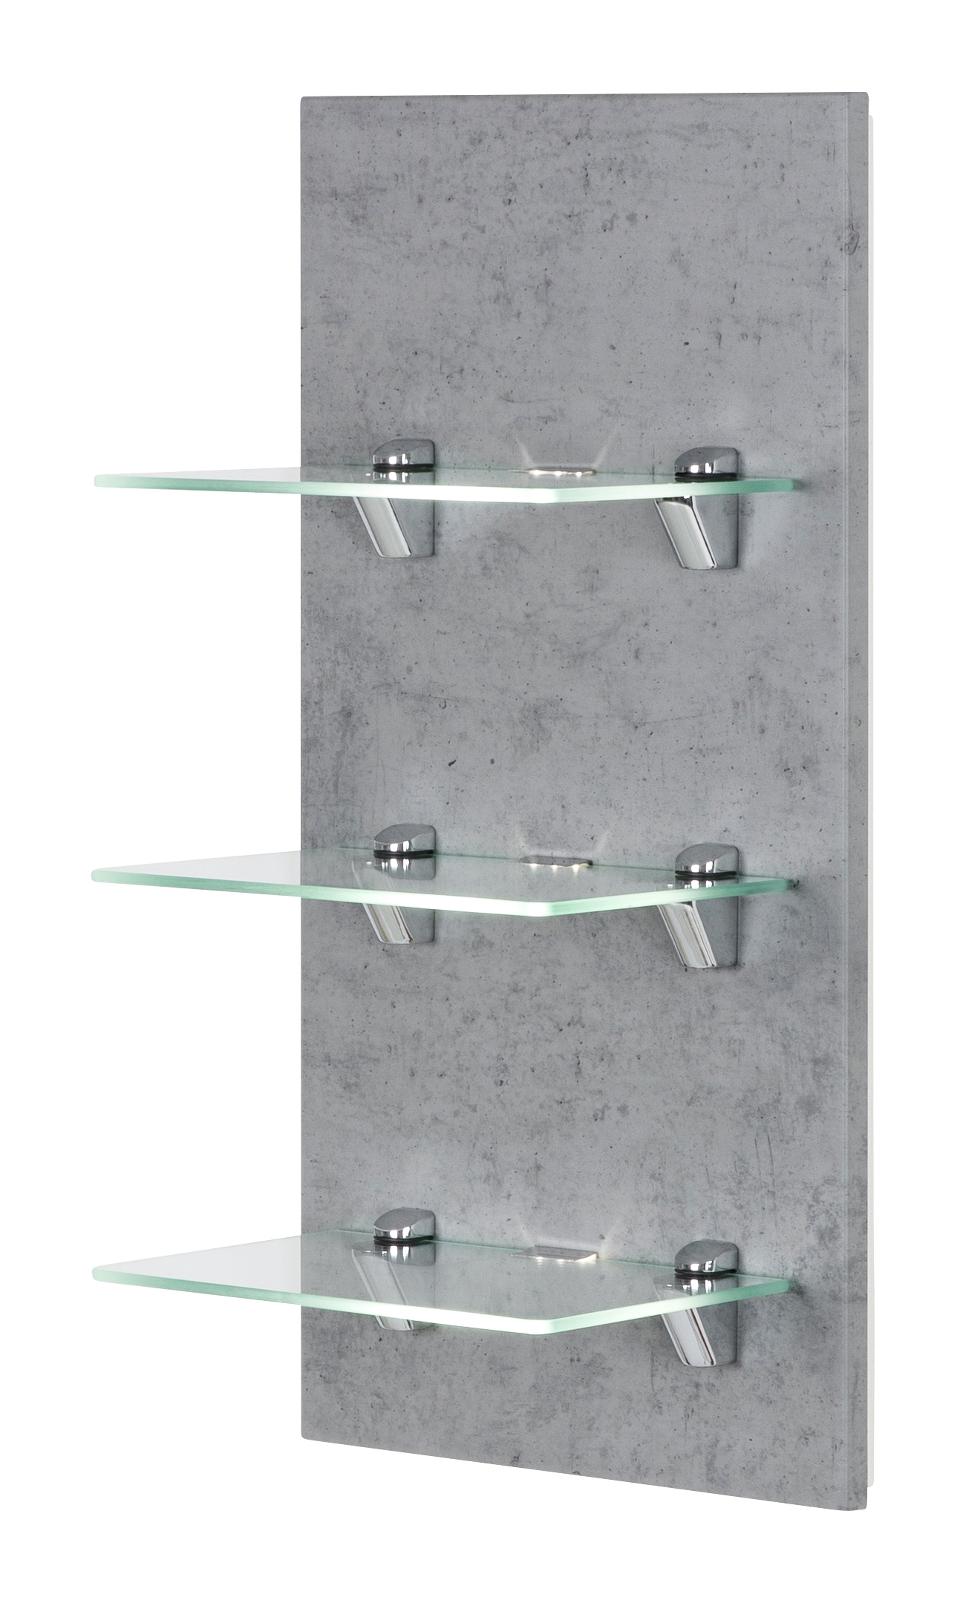 Badezimmer Regal hängend Viva in Stone Design grau Wandregal 20 x 20 cm  Hängeregal